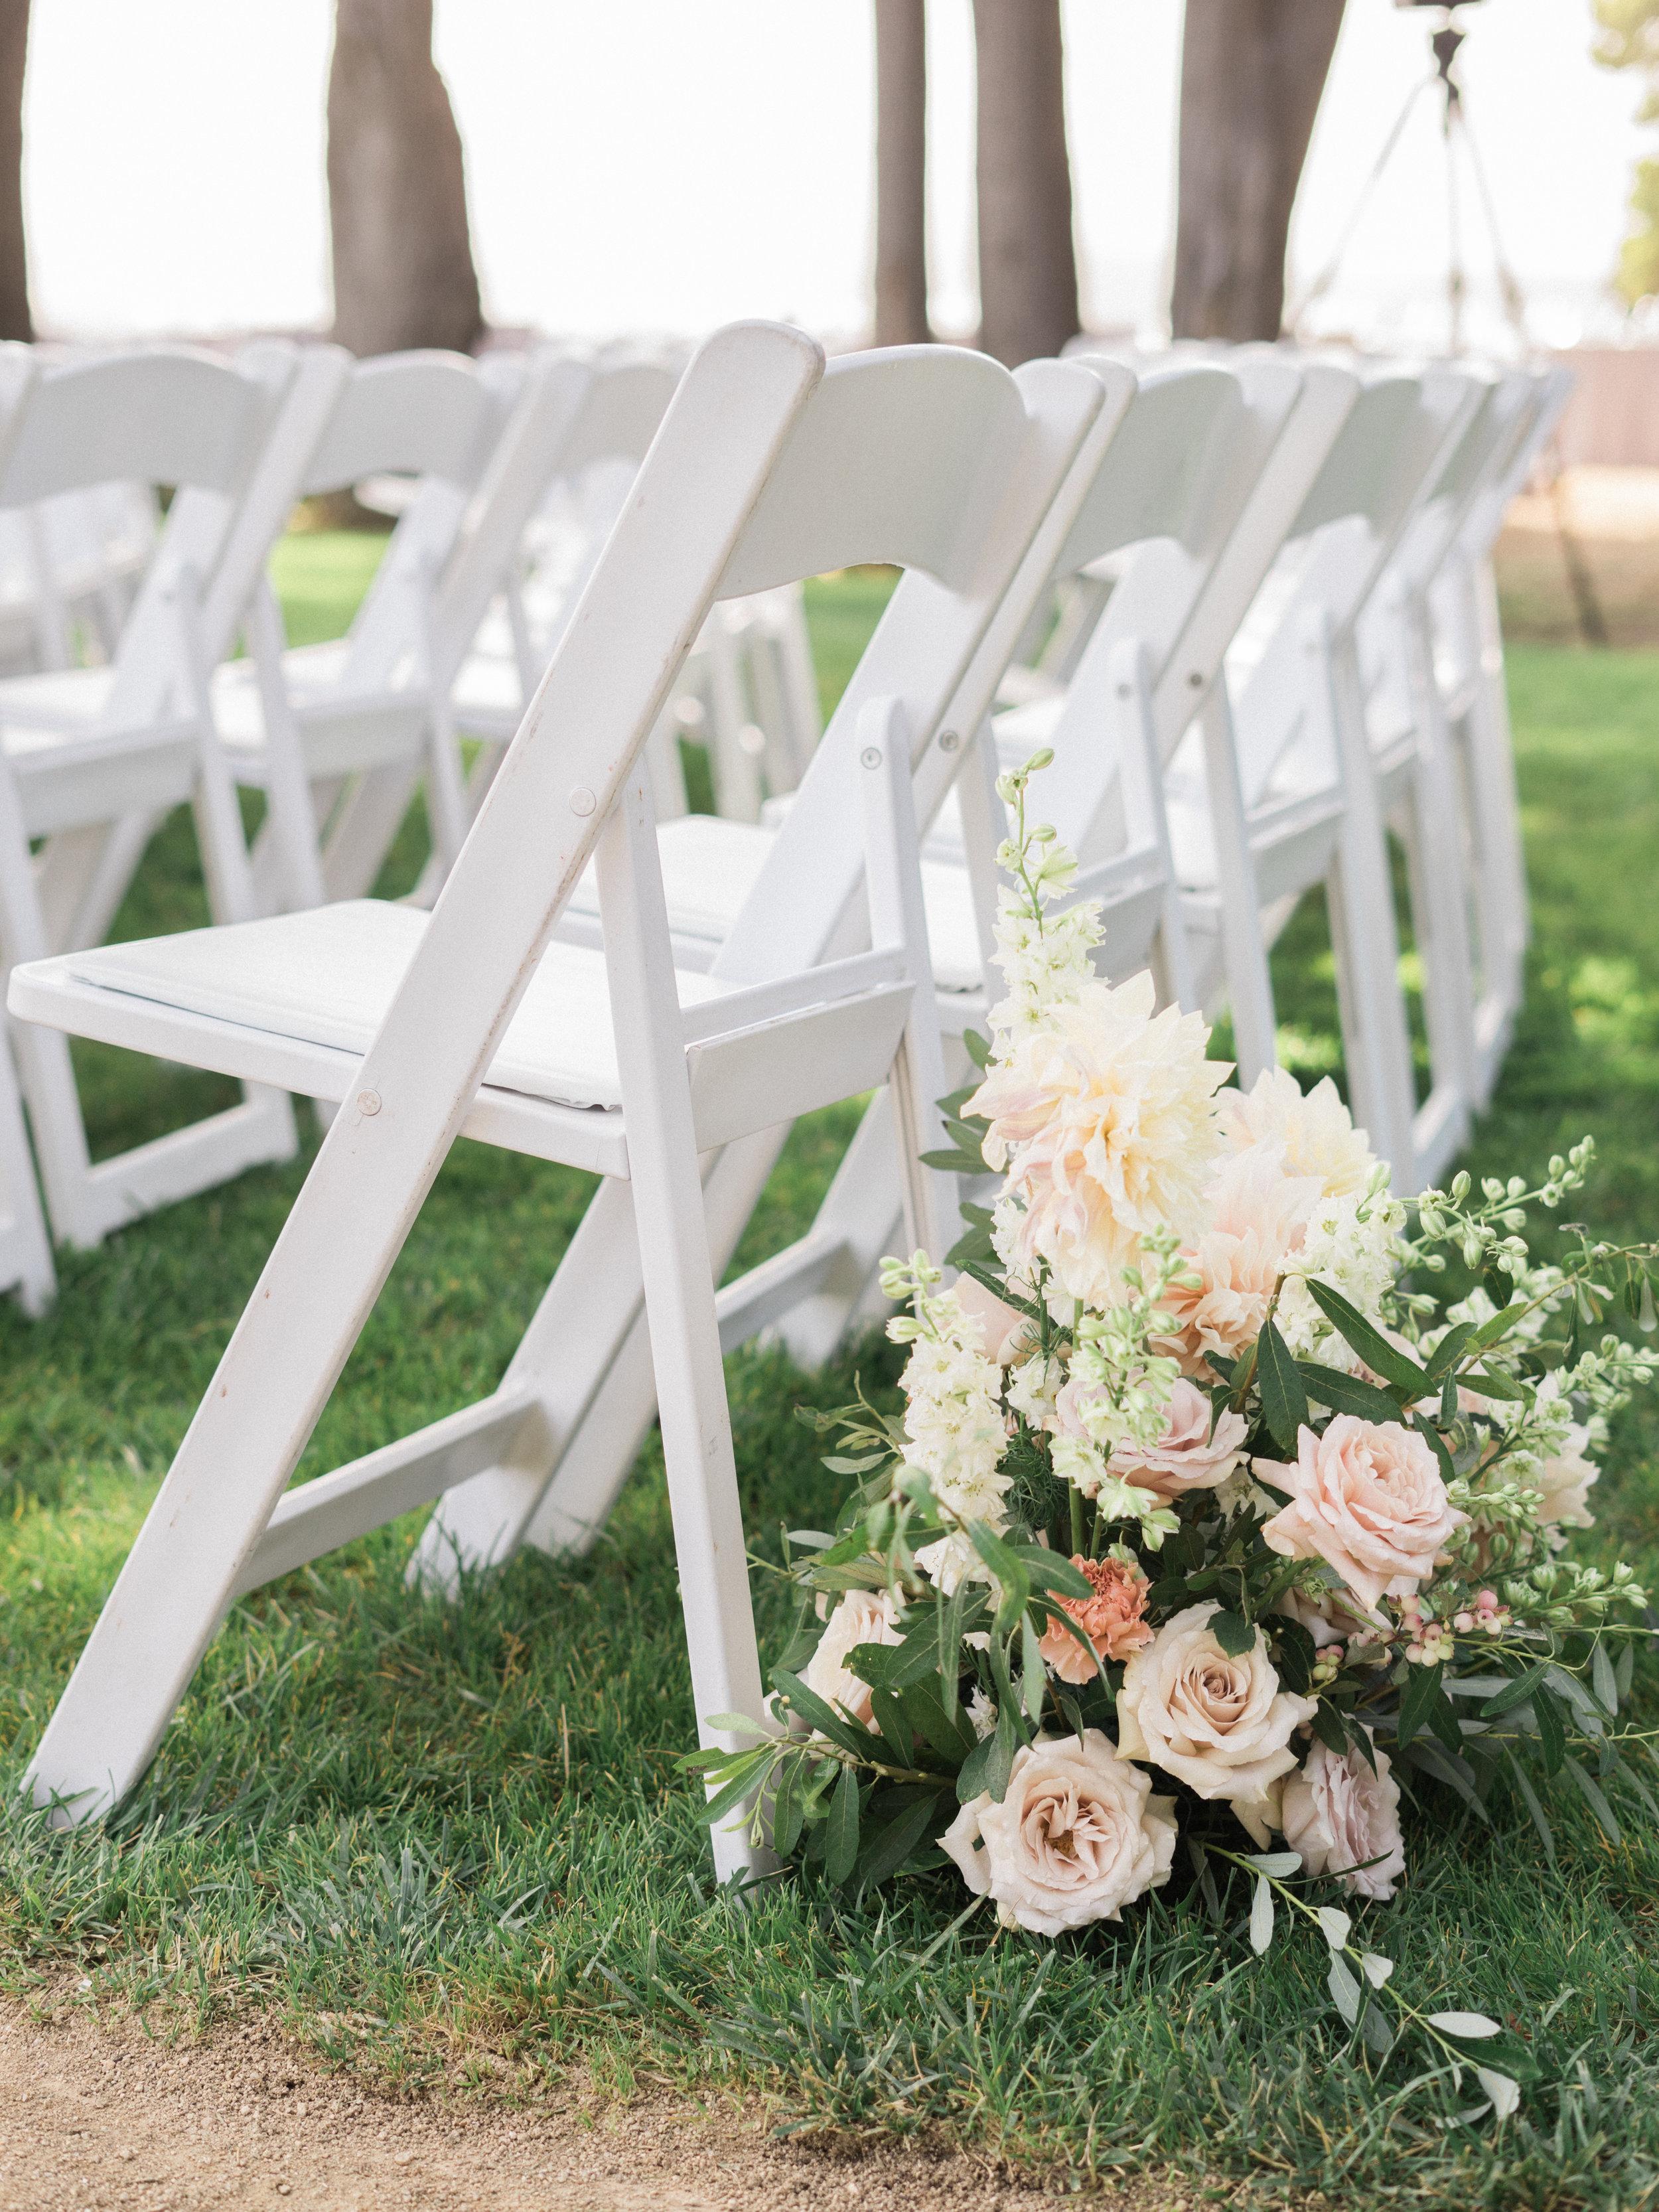 trynhphoto_socal_sf_halfmoon_bay_wedding_photographer_JA-275.jpg